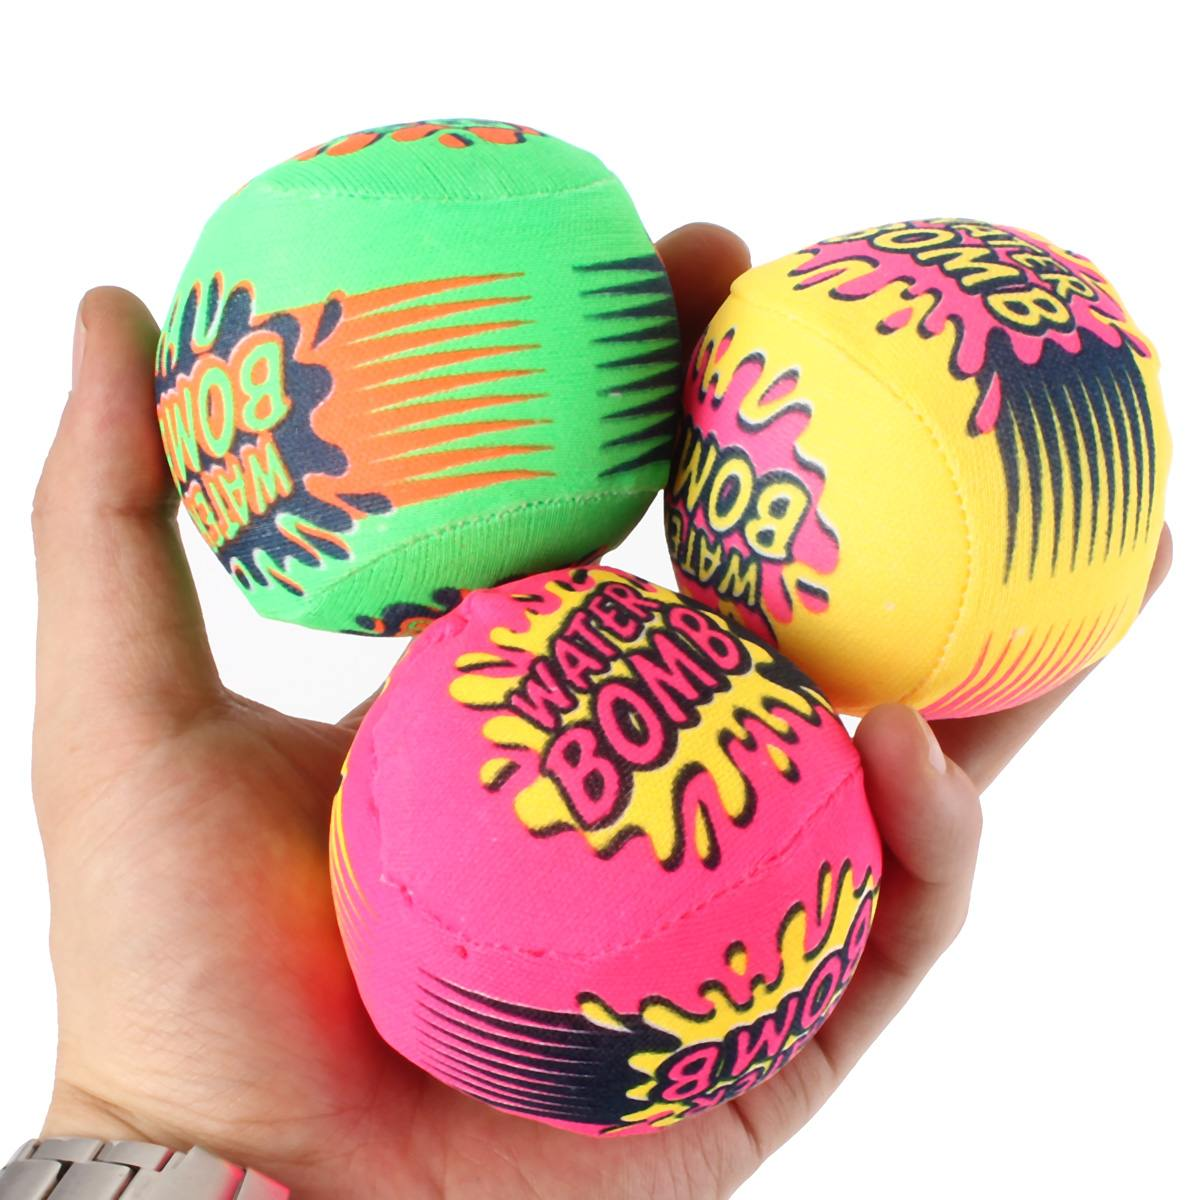 Juego de 3 bolas divertidas para salpicaduras, bomba de agua para niño, Chico, piscina, actividades de verano, playa, fiesta, Juguetes